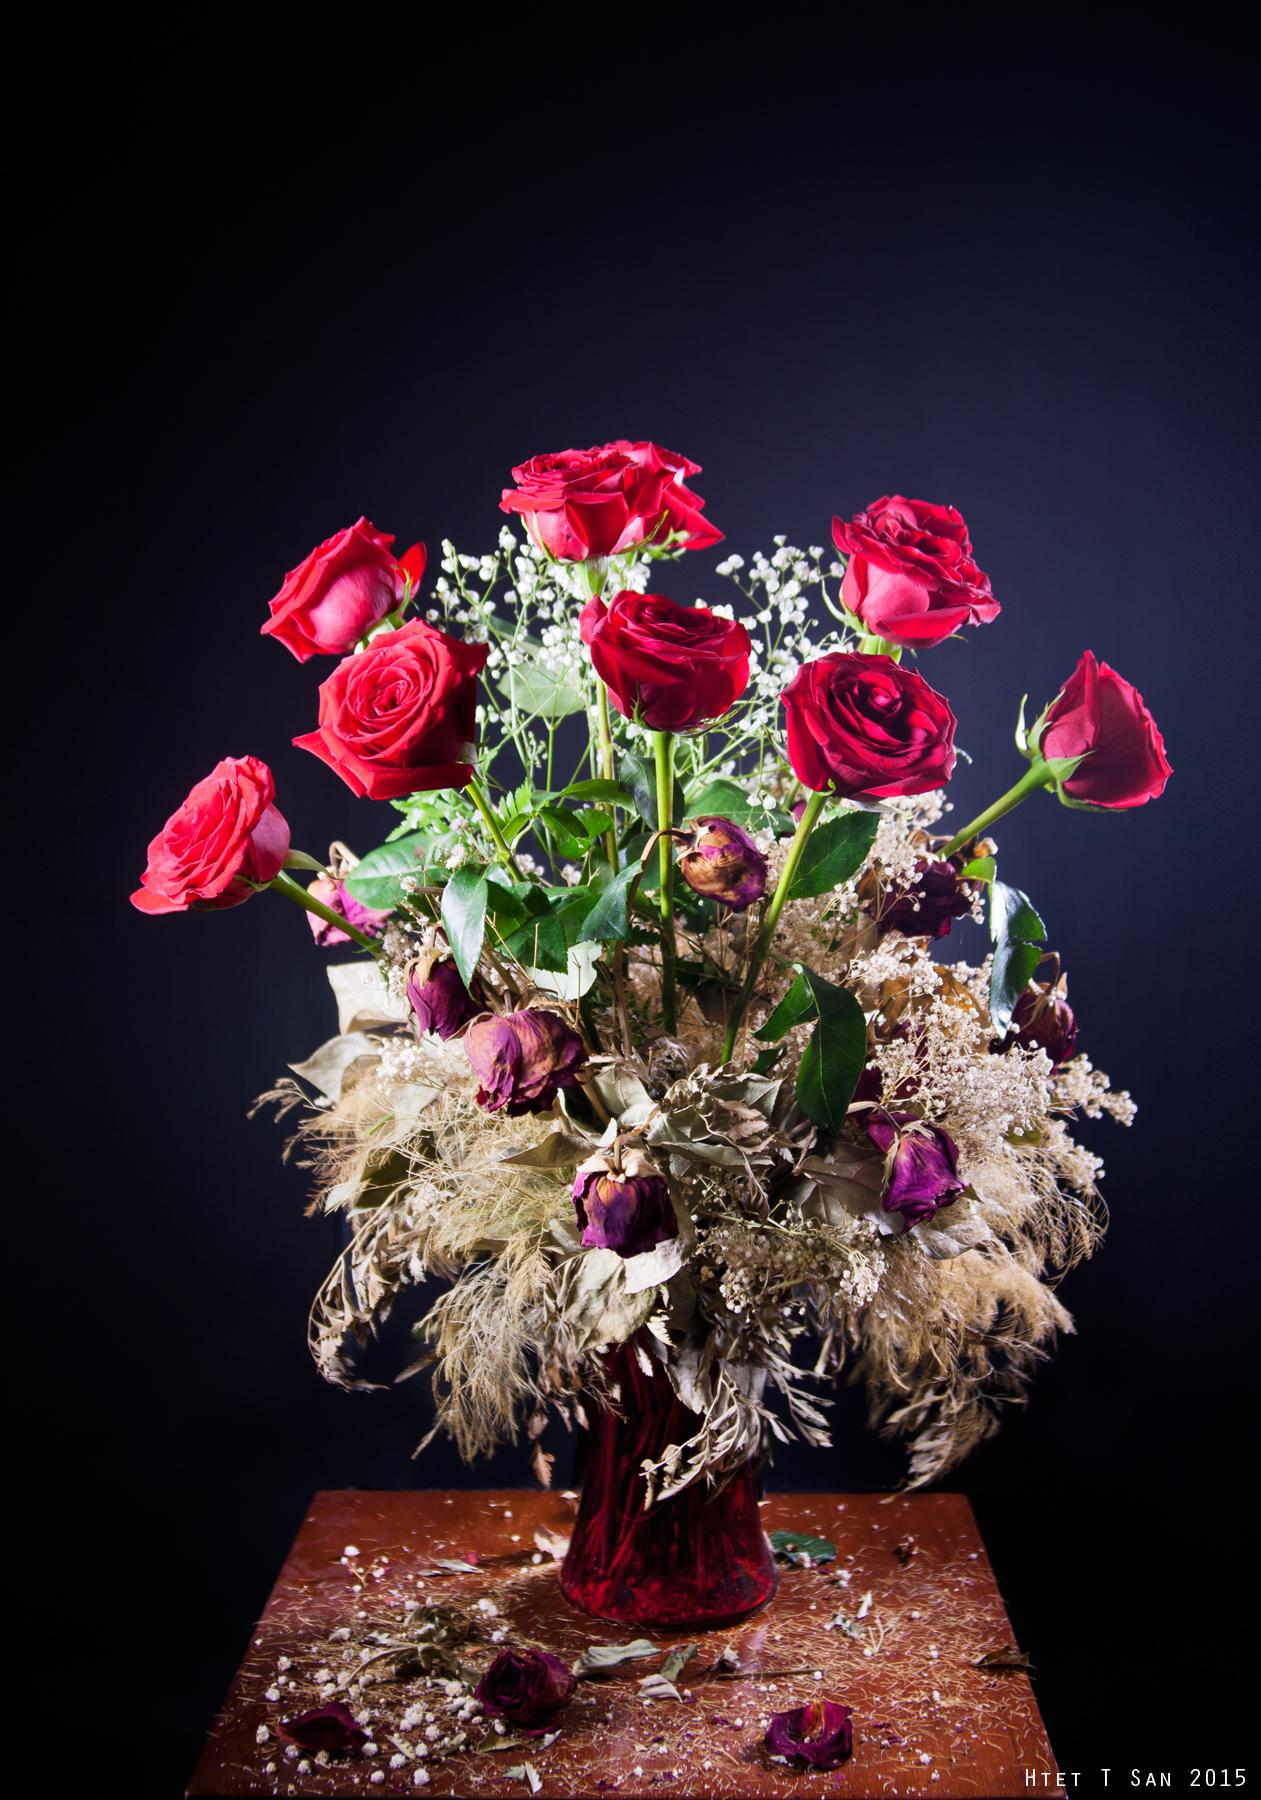 To Wilt is To Bloom _Htet T San 3.jpg